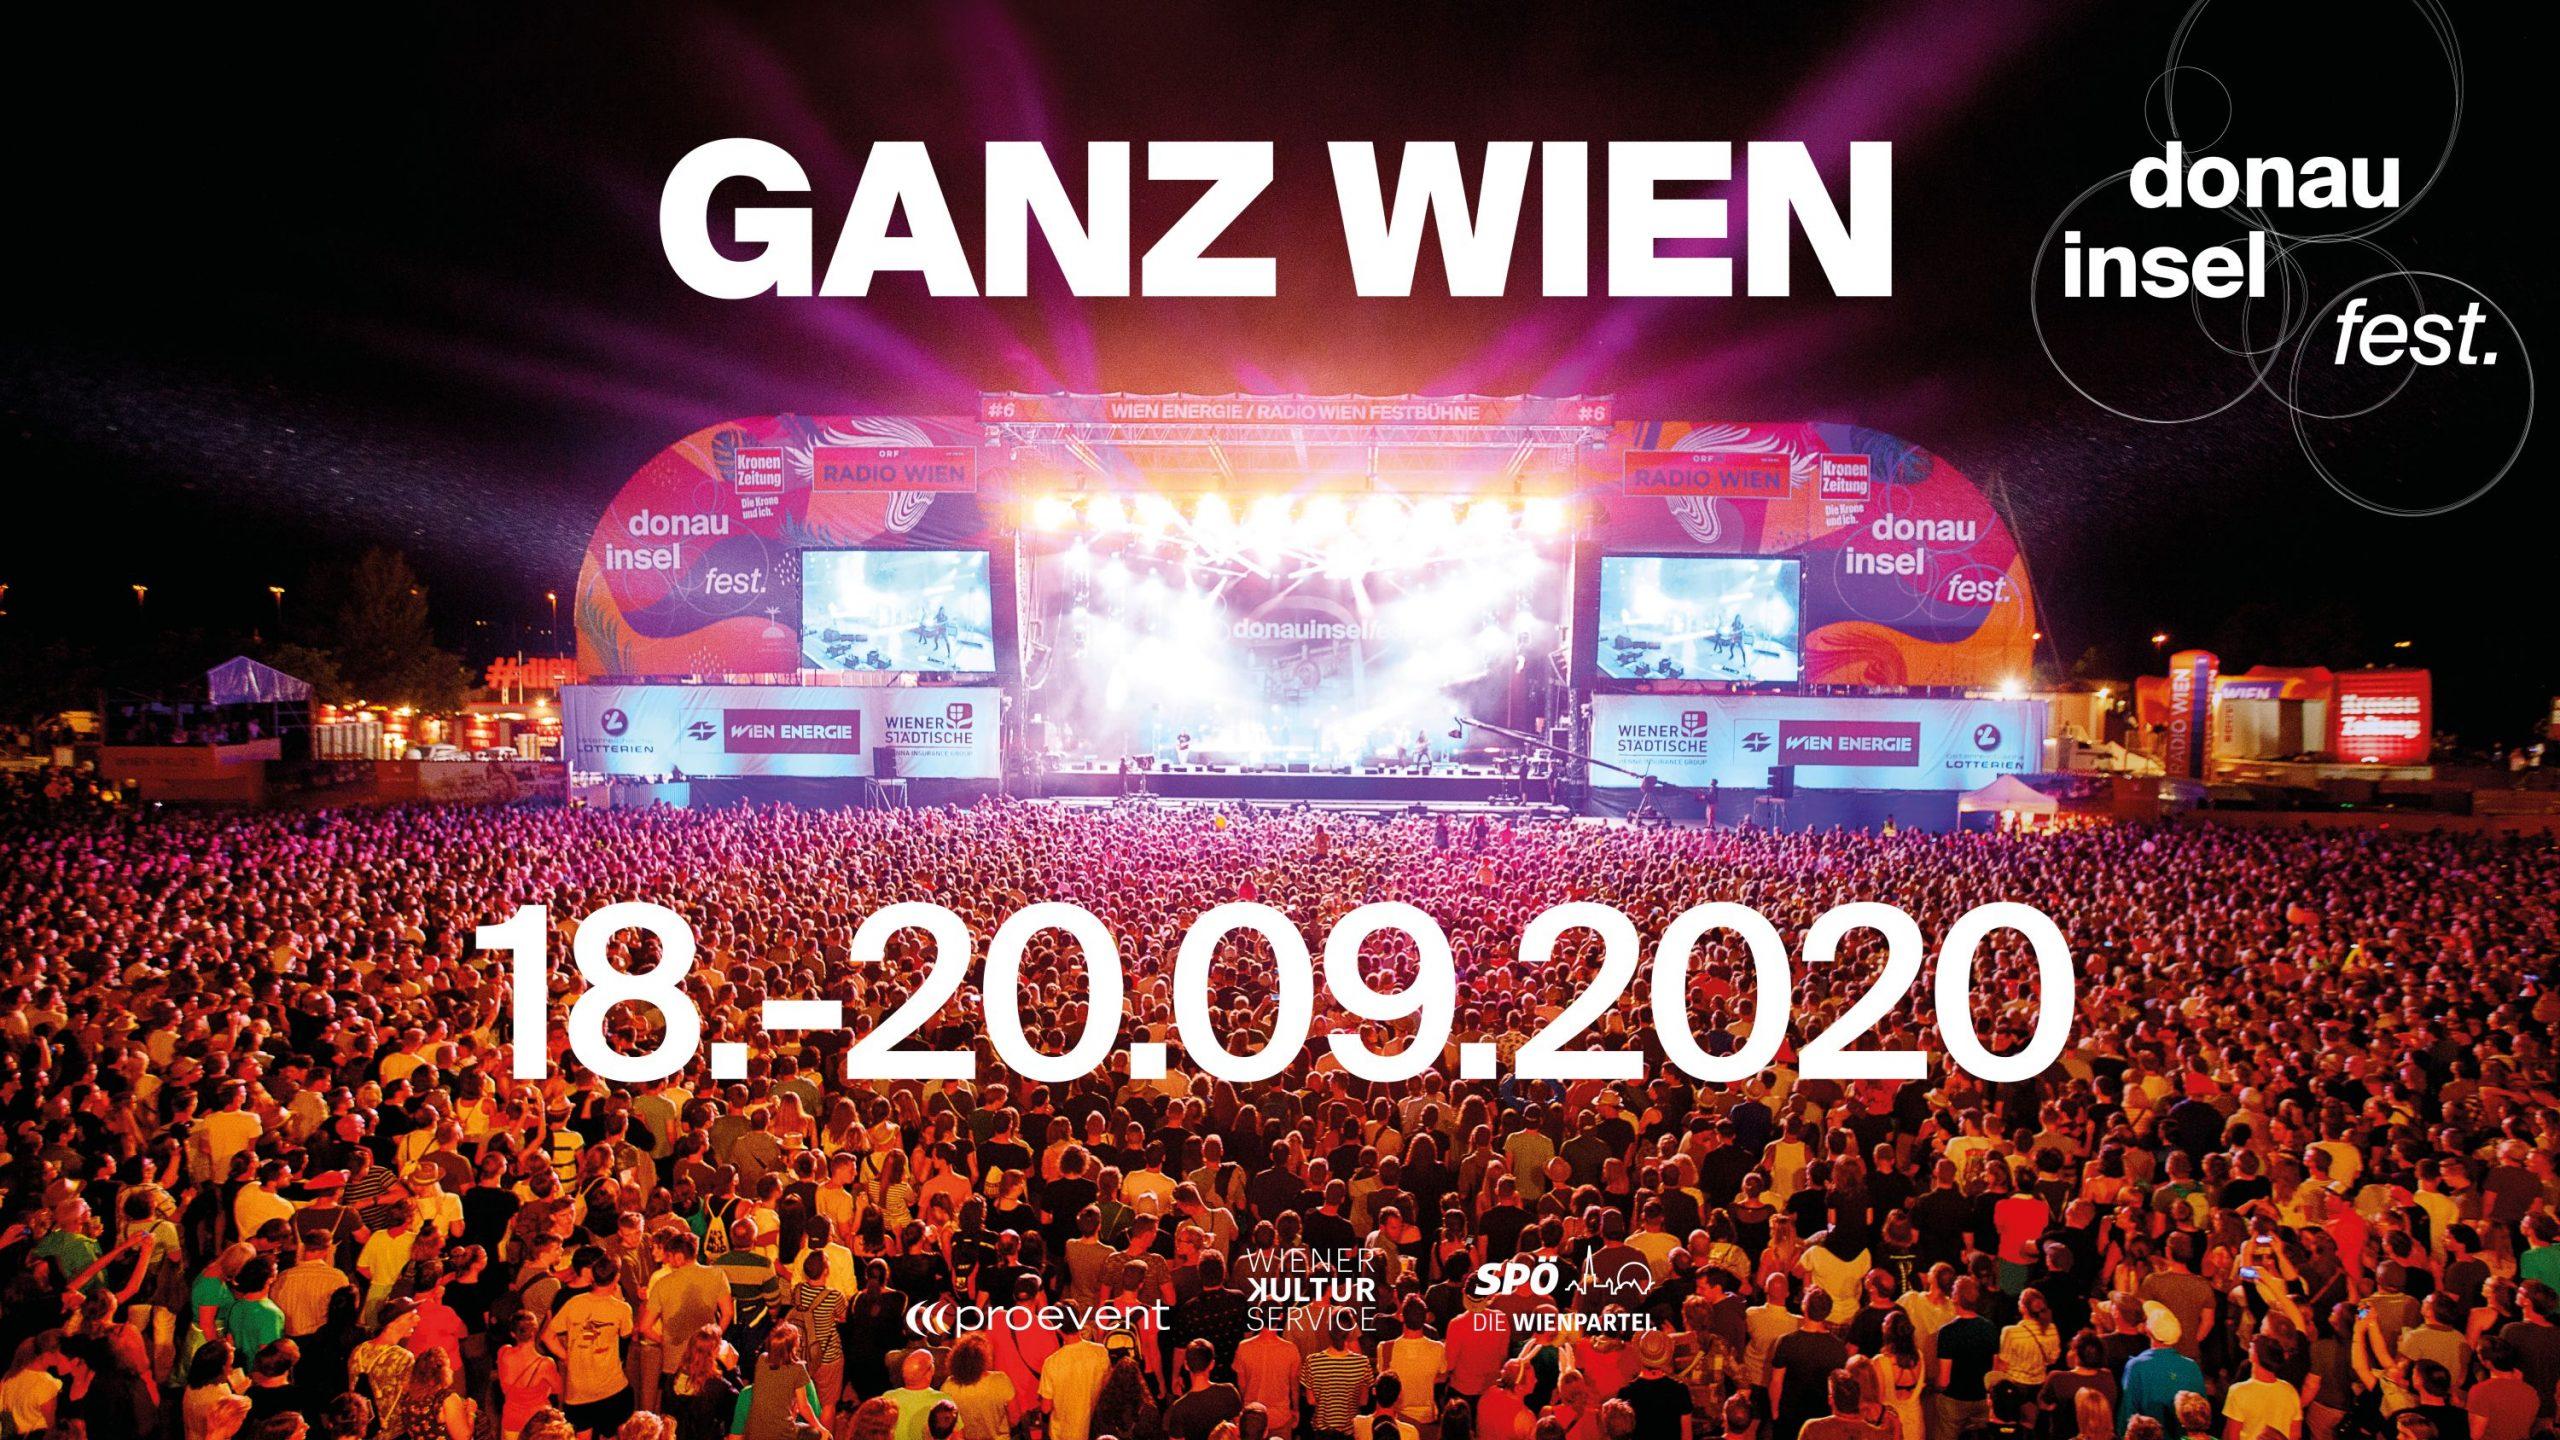 Donauinselfest 2020 am 26. June 2020 @ Donauinsel.